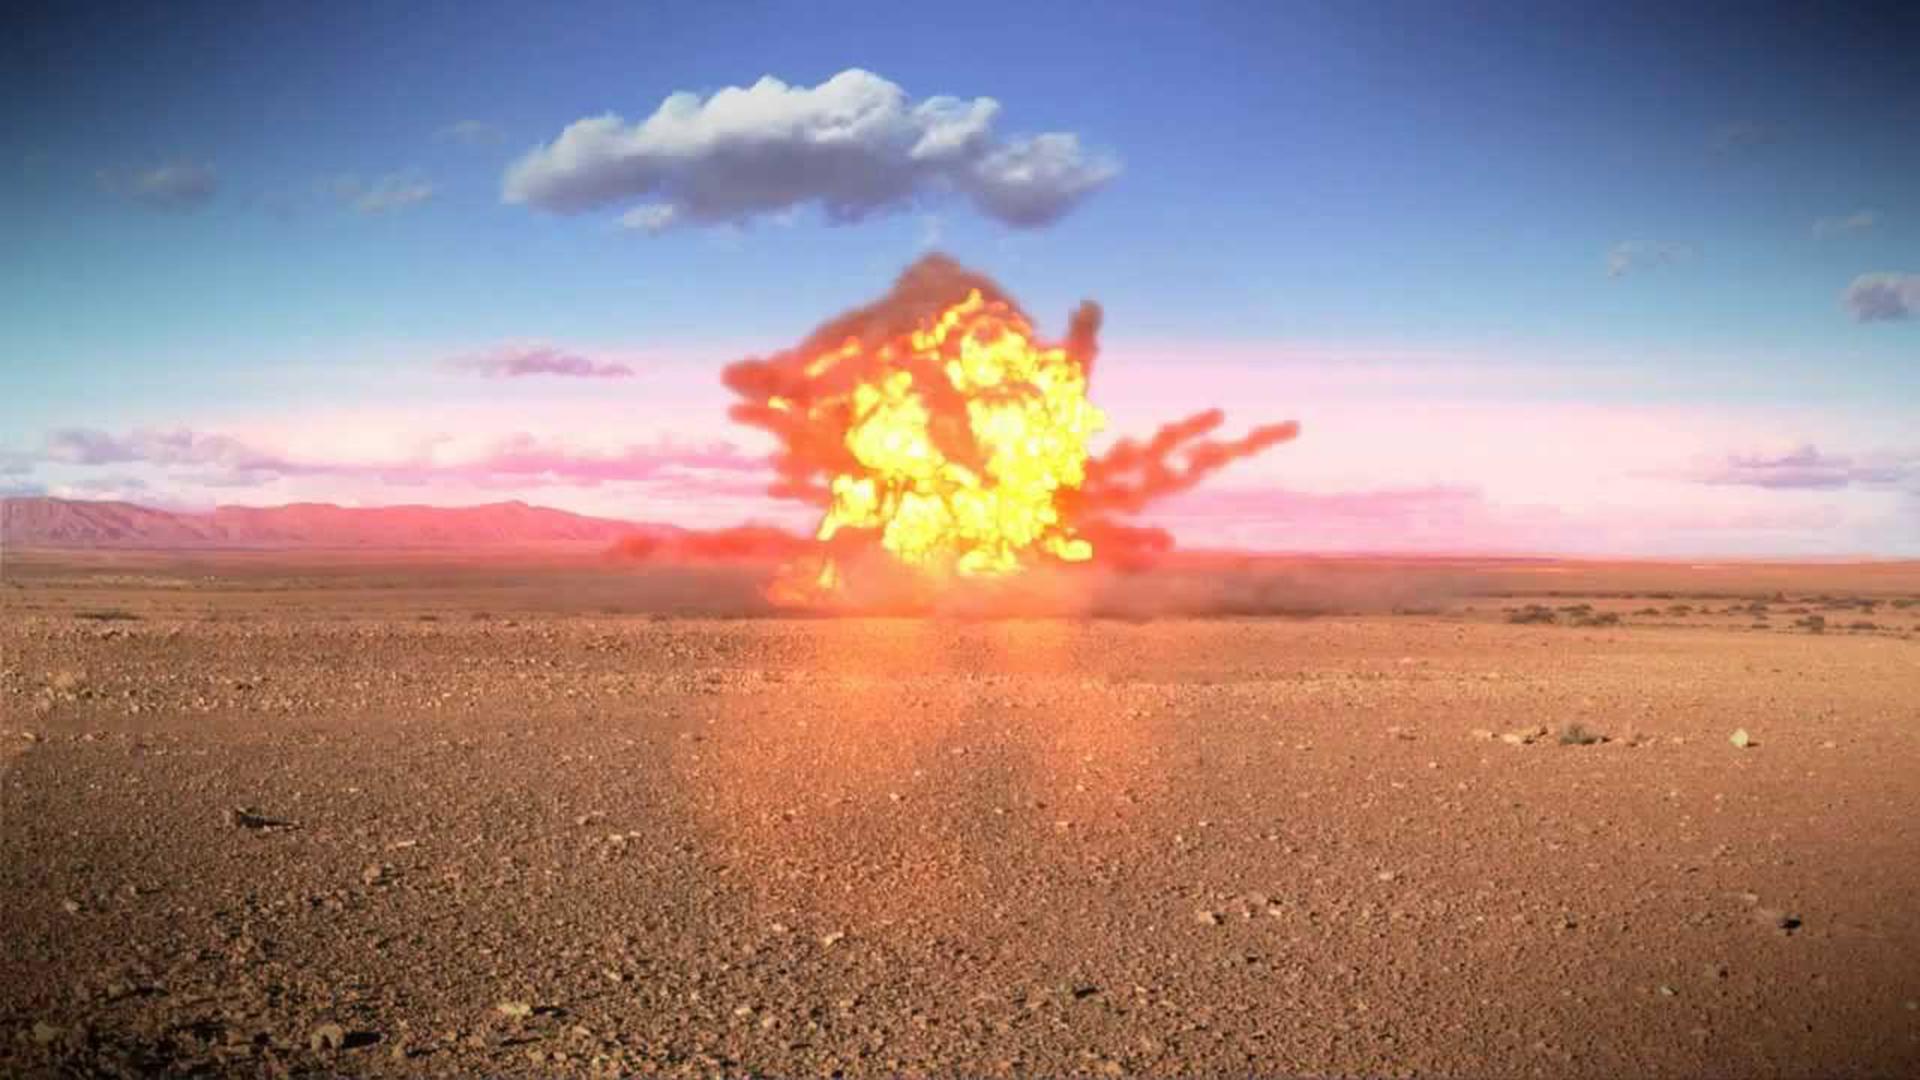 Blender3d - создание реалистичного взрыва